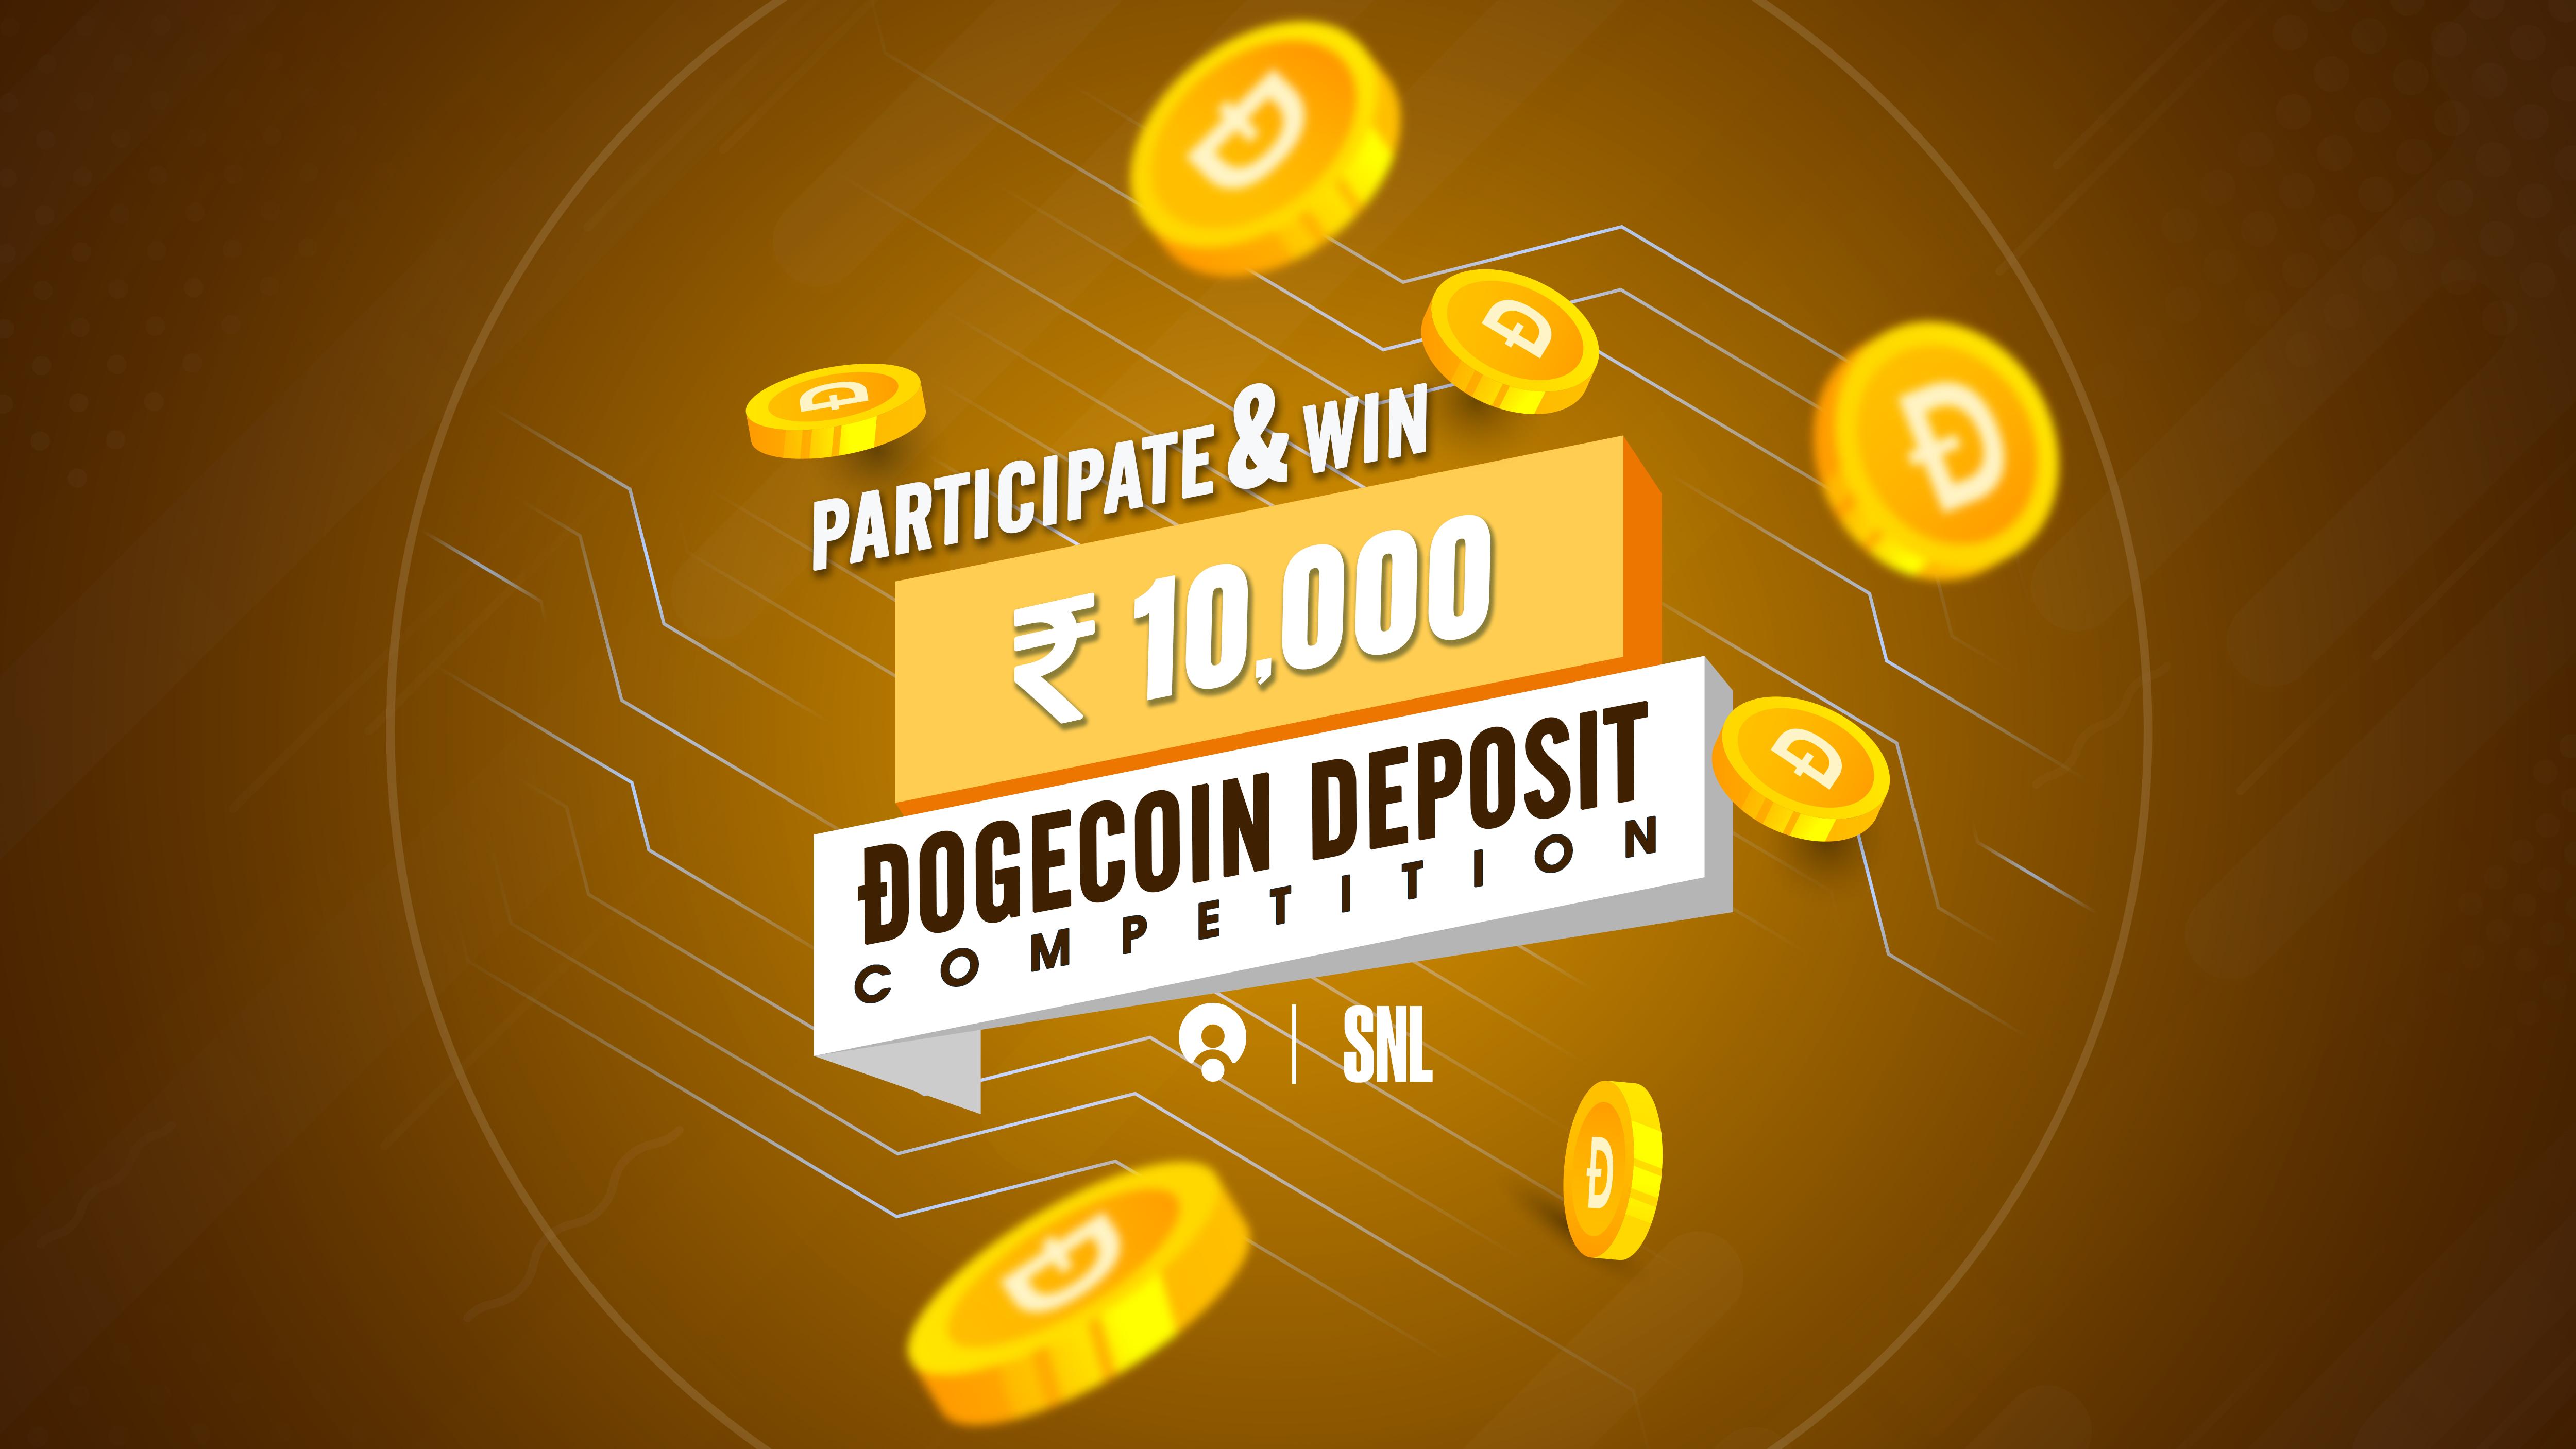 Dogecoin SNL Deposits Contest